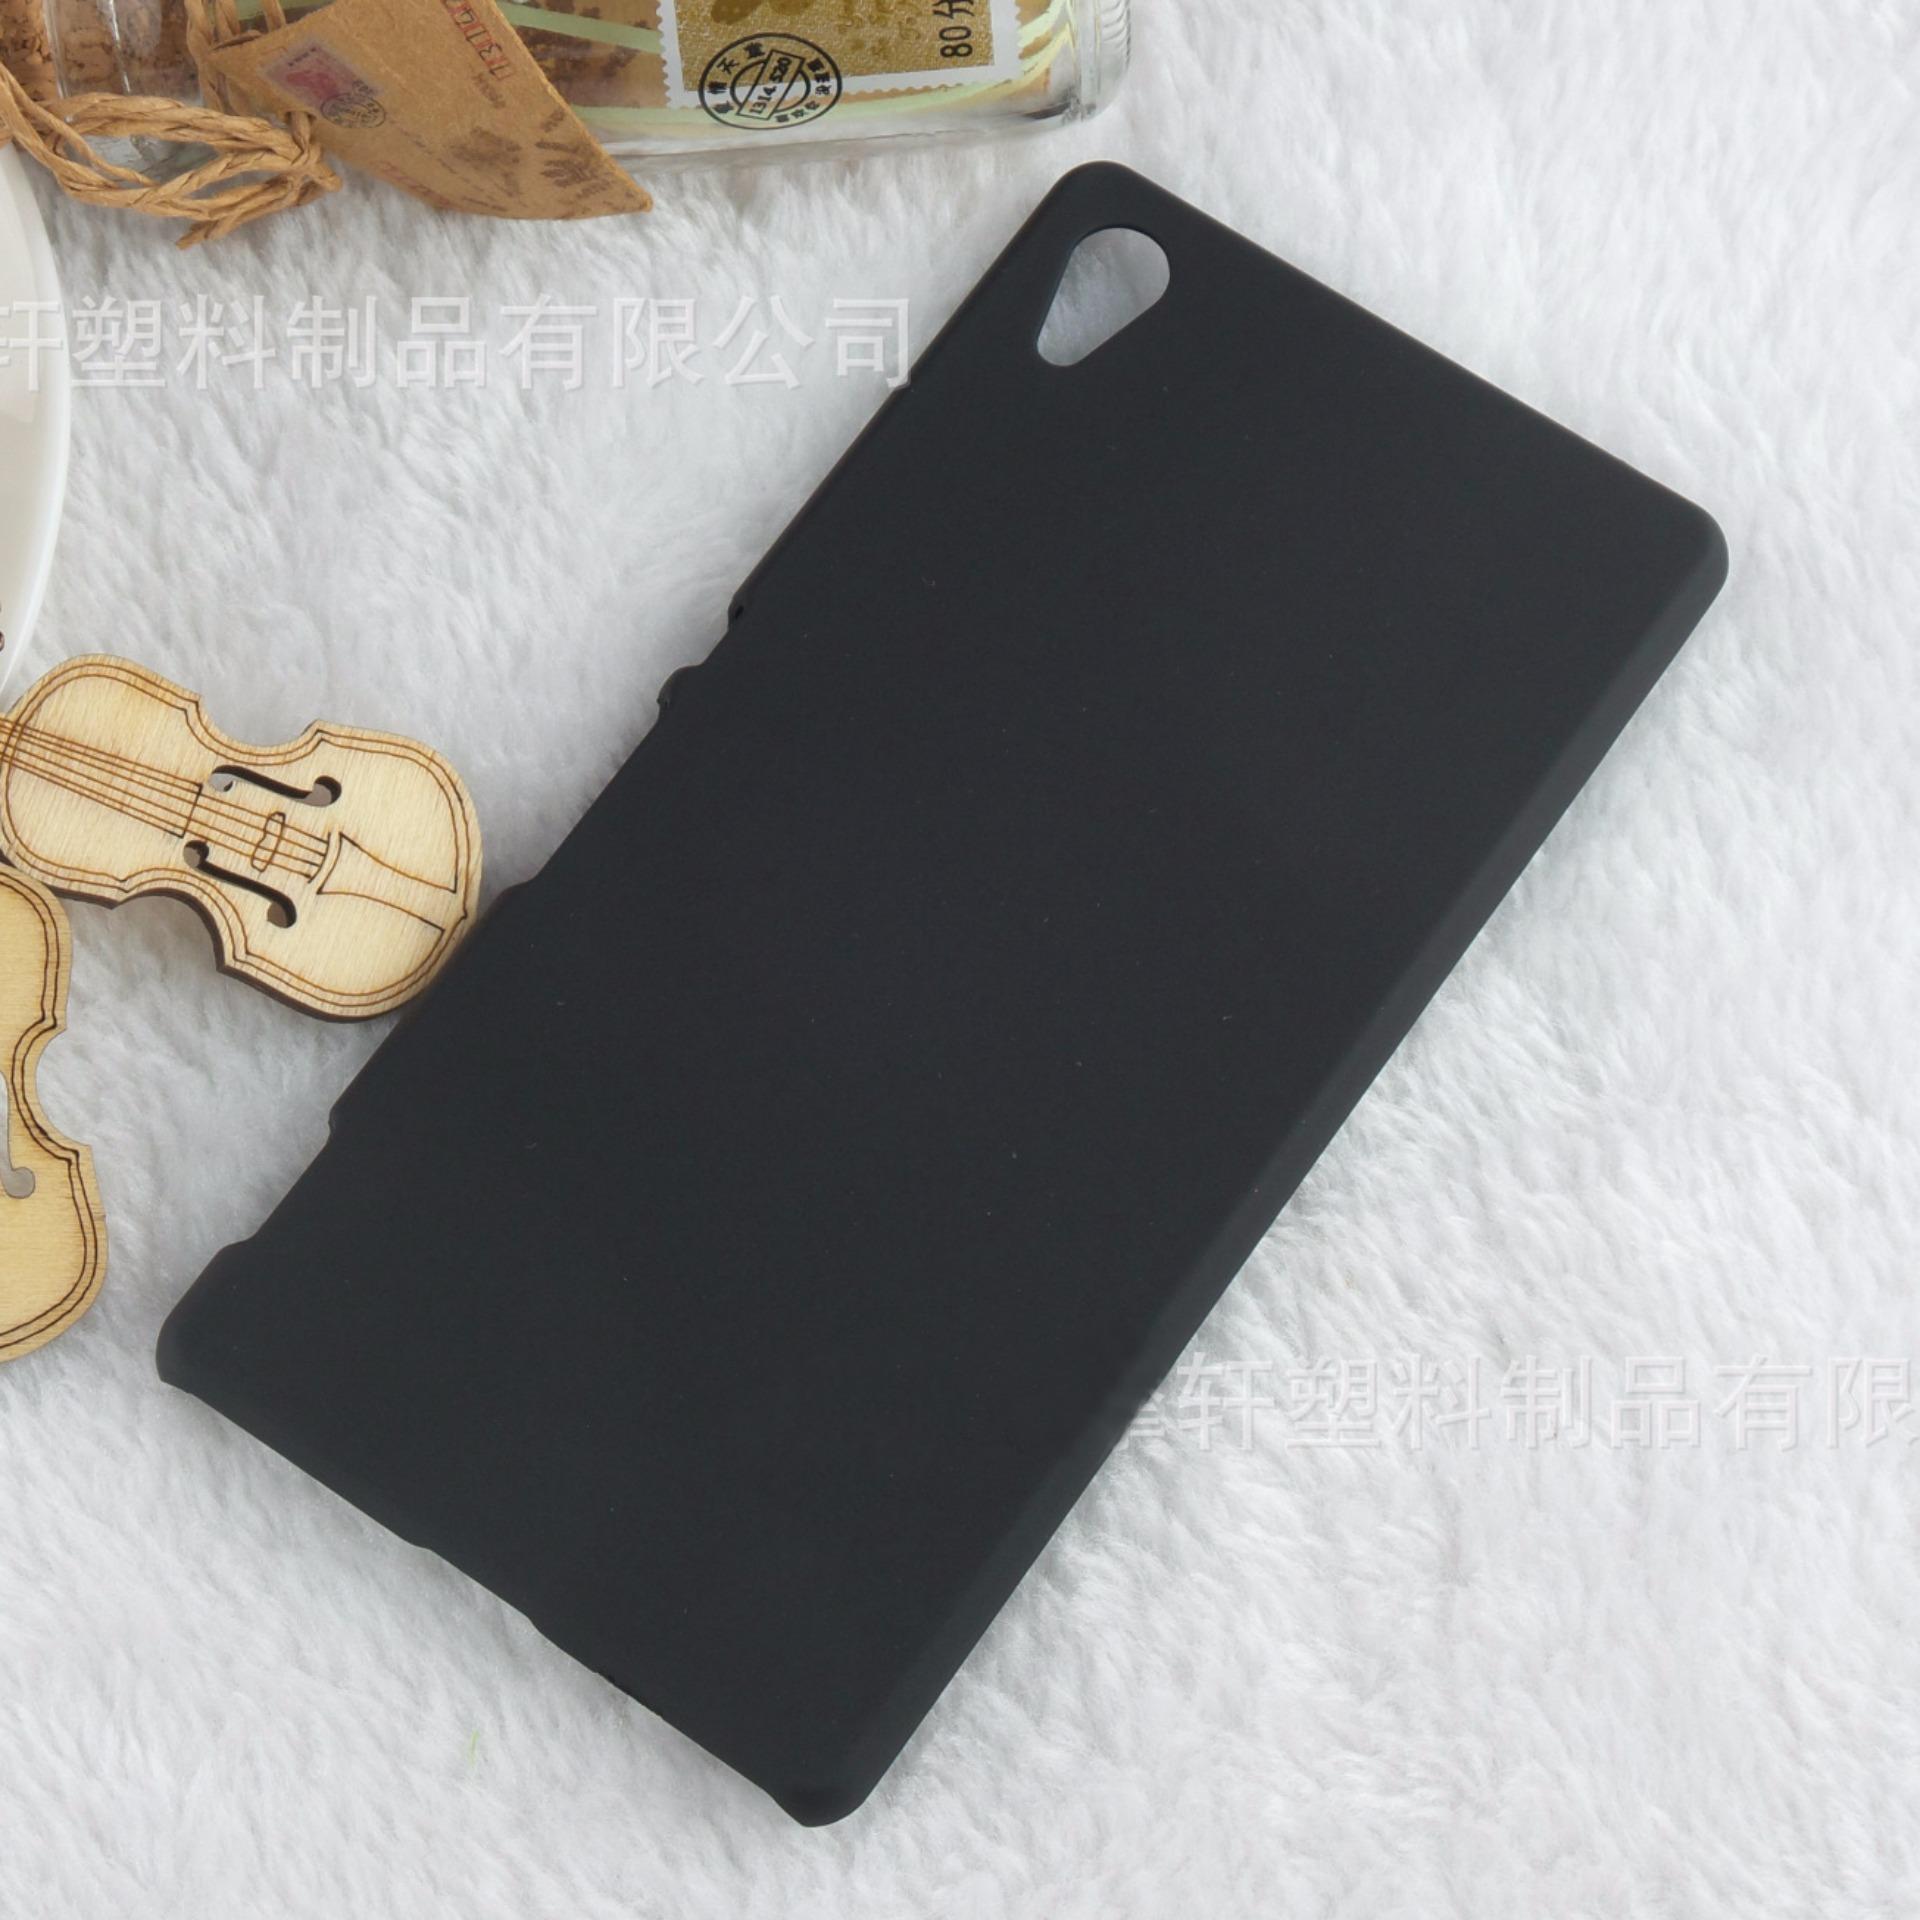 Case Slim Black Matte Sony Xperia Z3+ - Black Doff